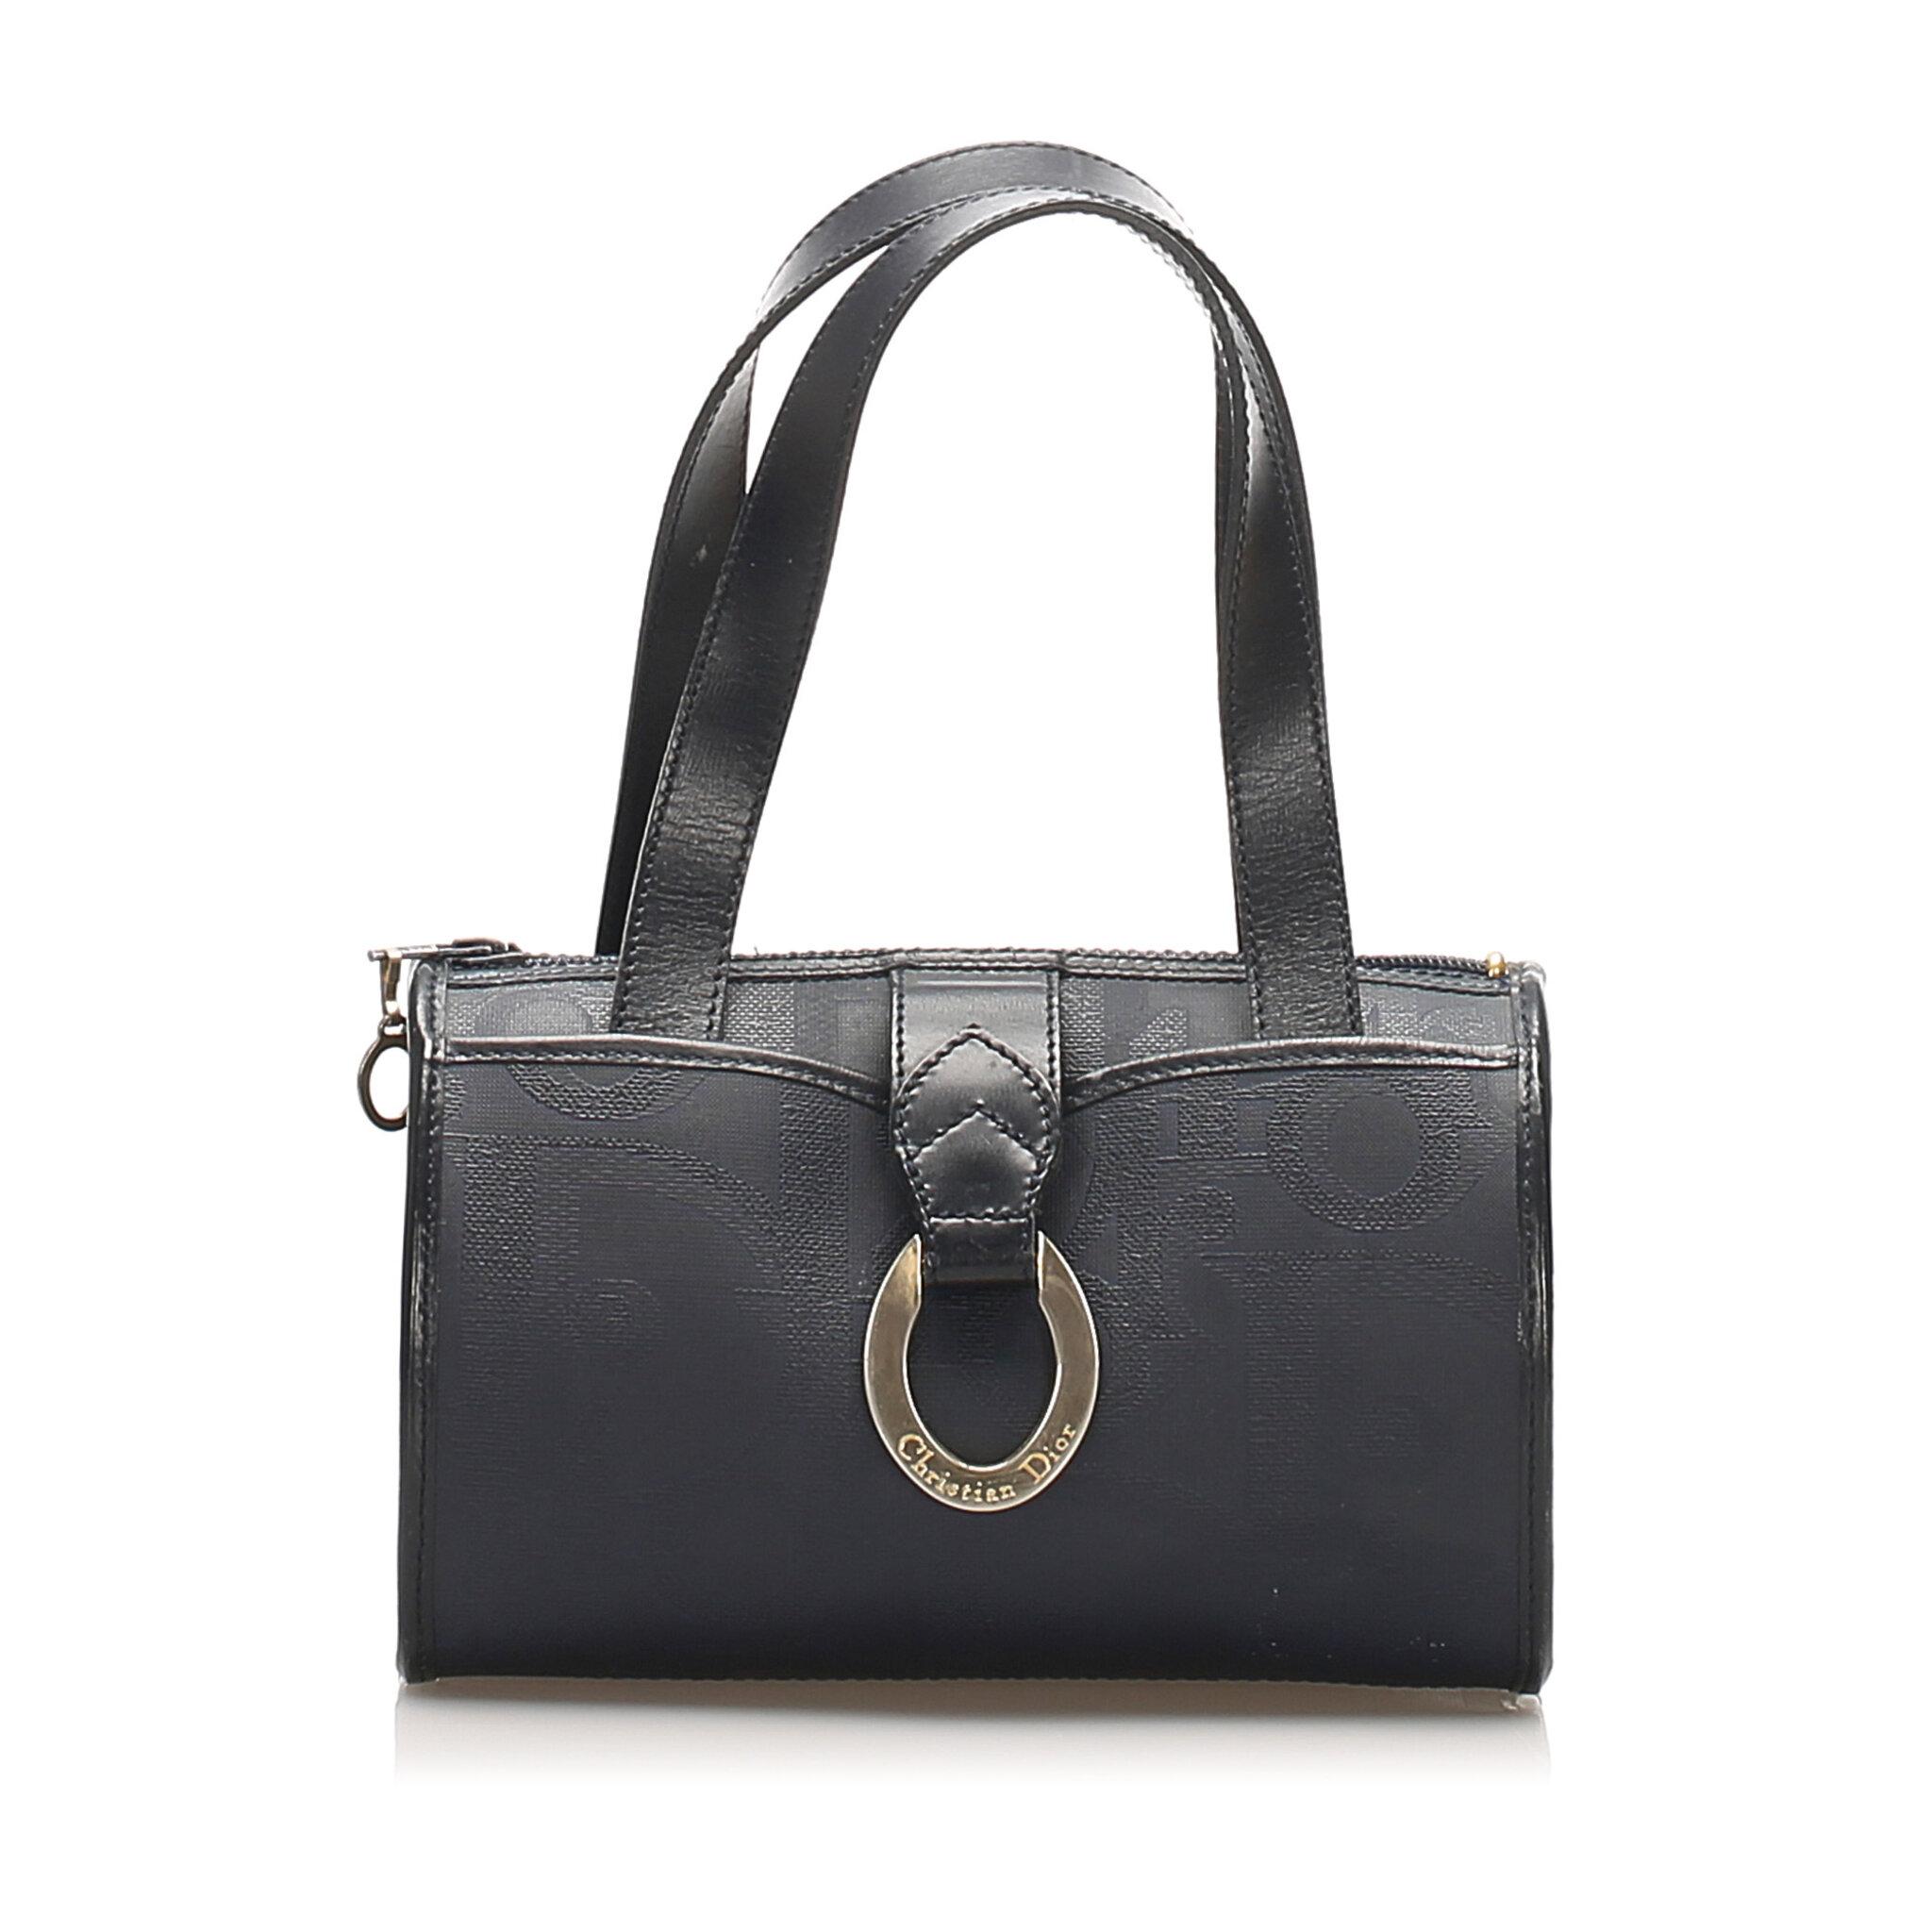 Dior Dior Oblique Pvc Handbag